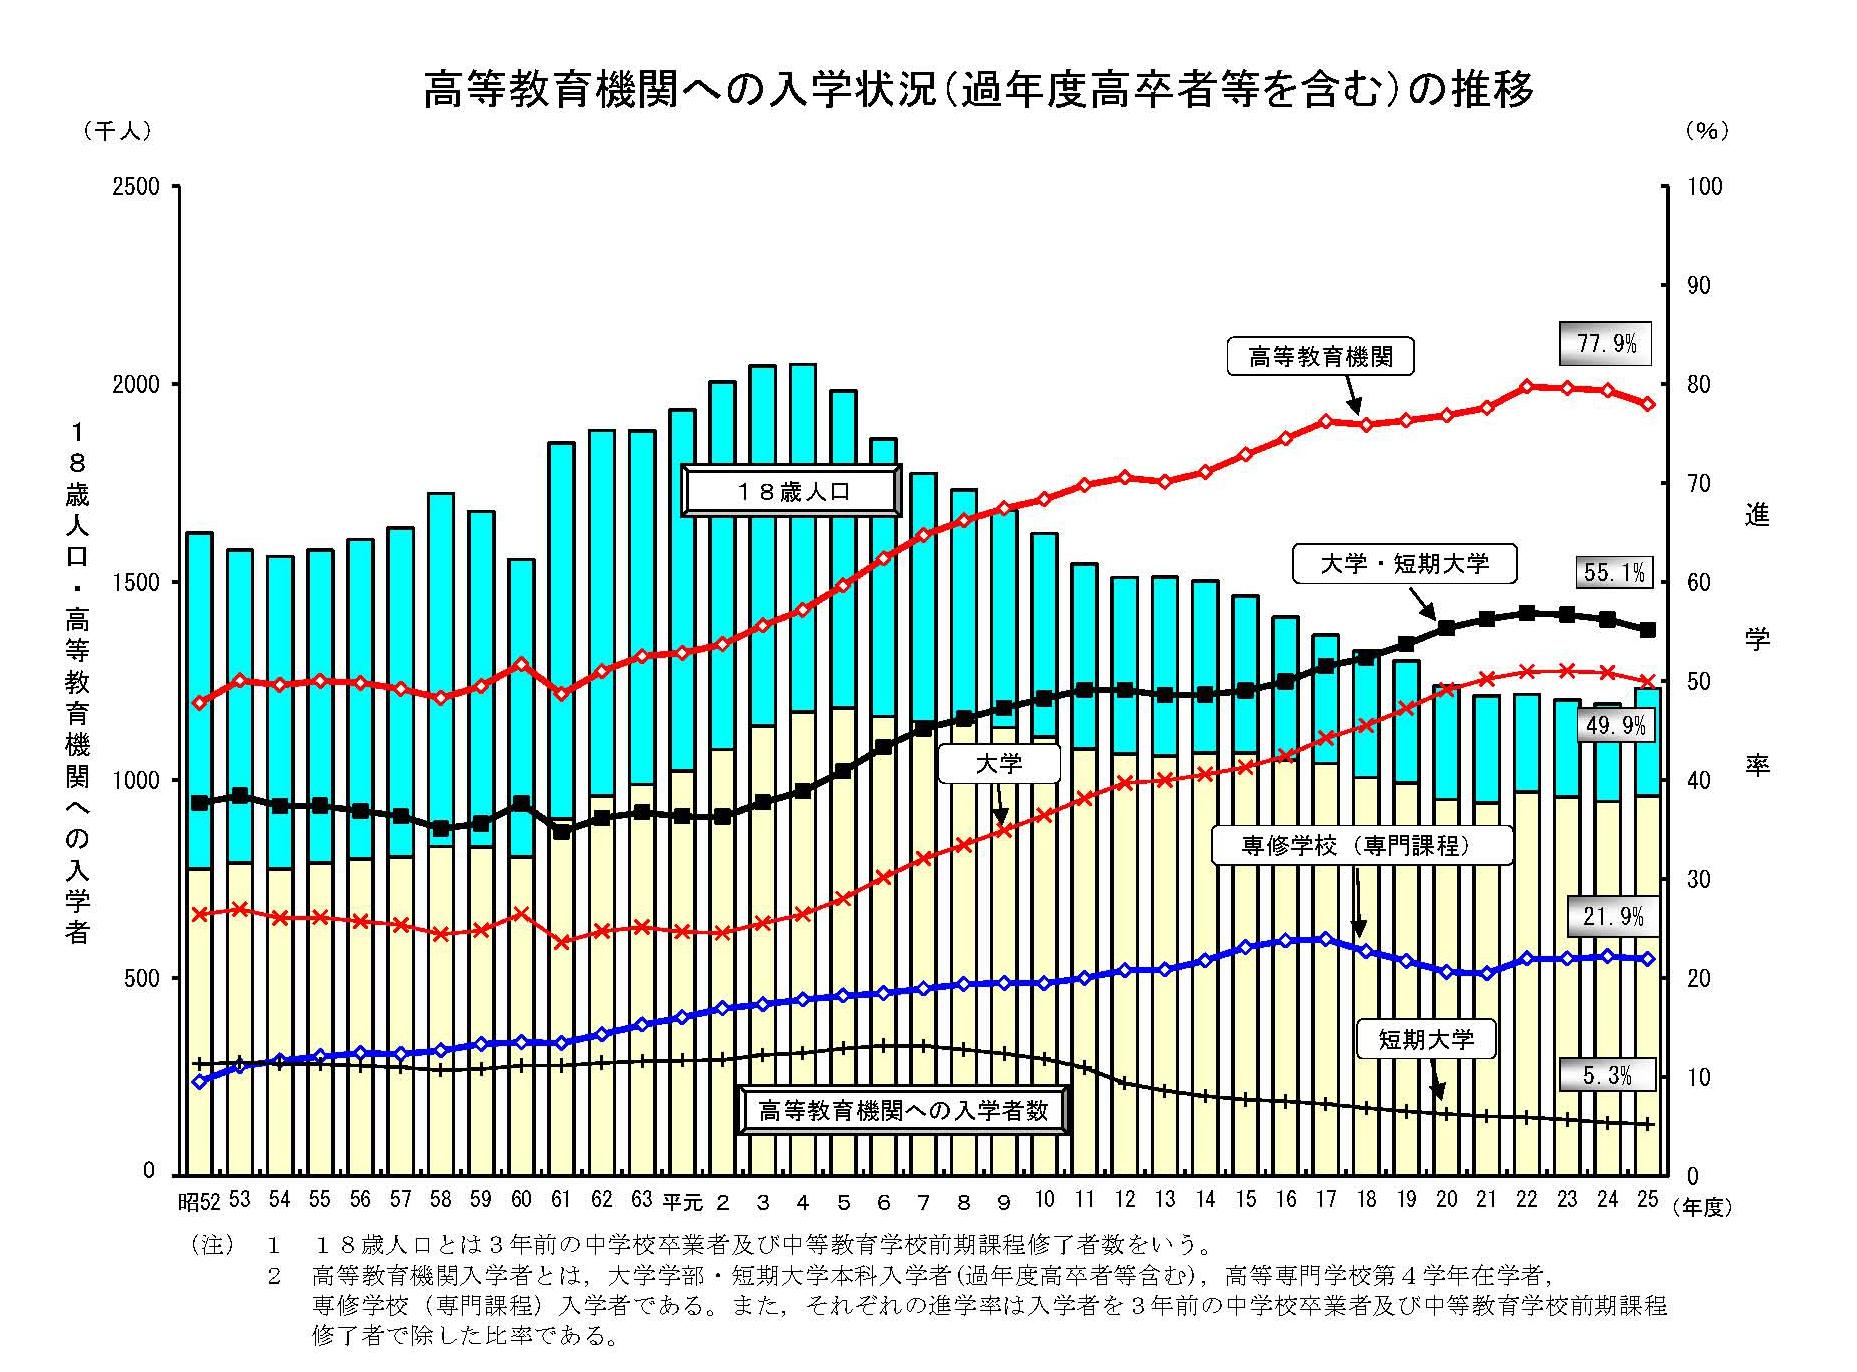 takao_essay_graph.jpg